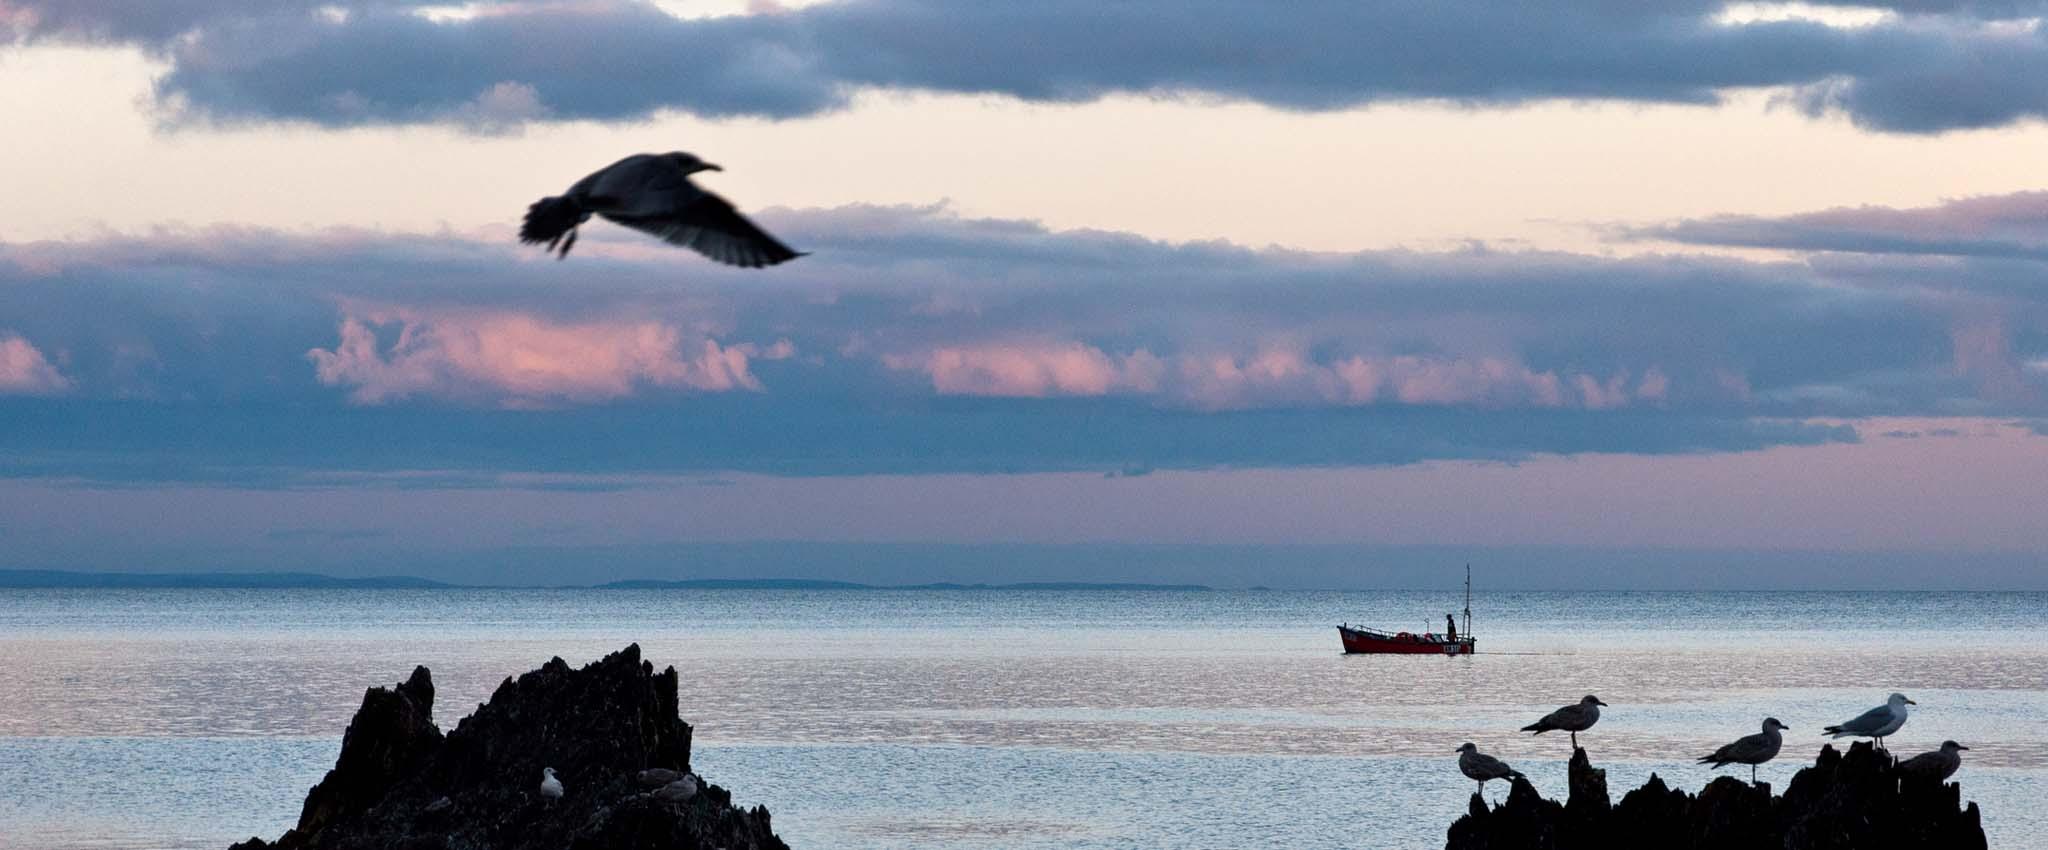 Mevagissey Gulls